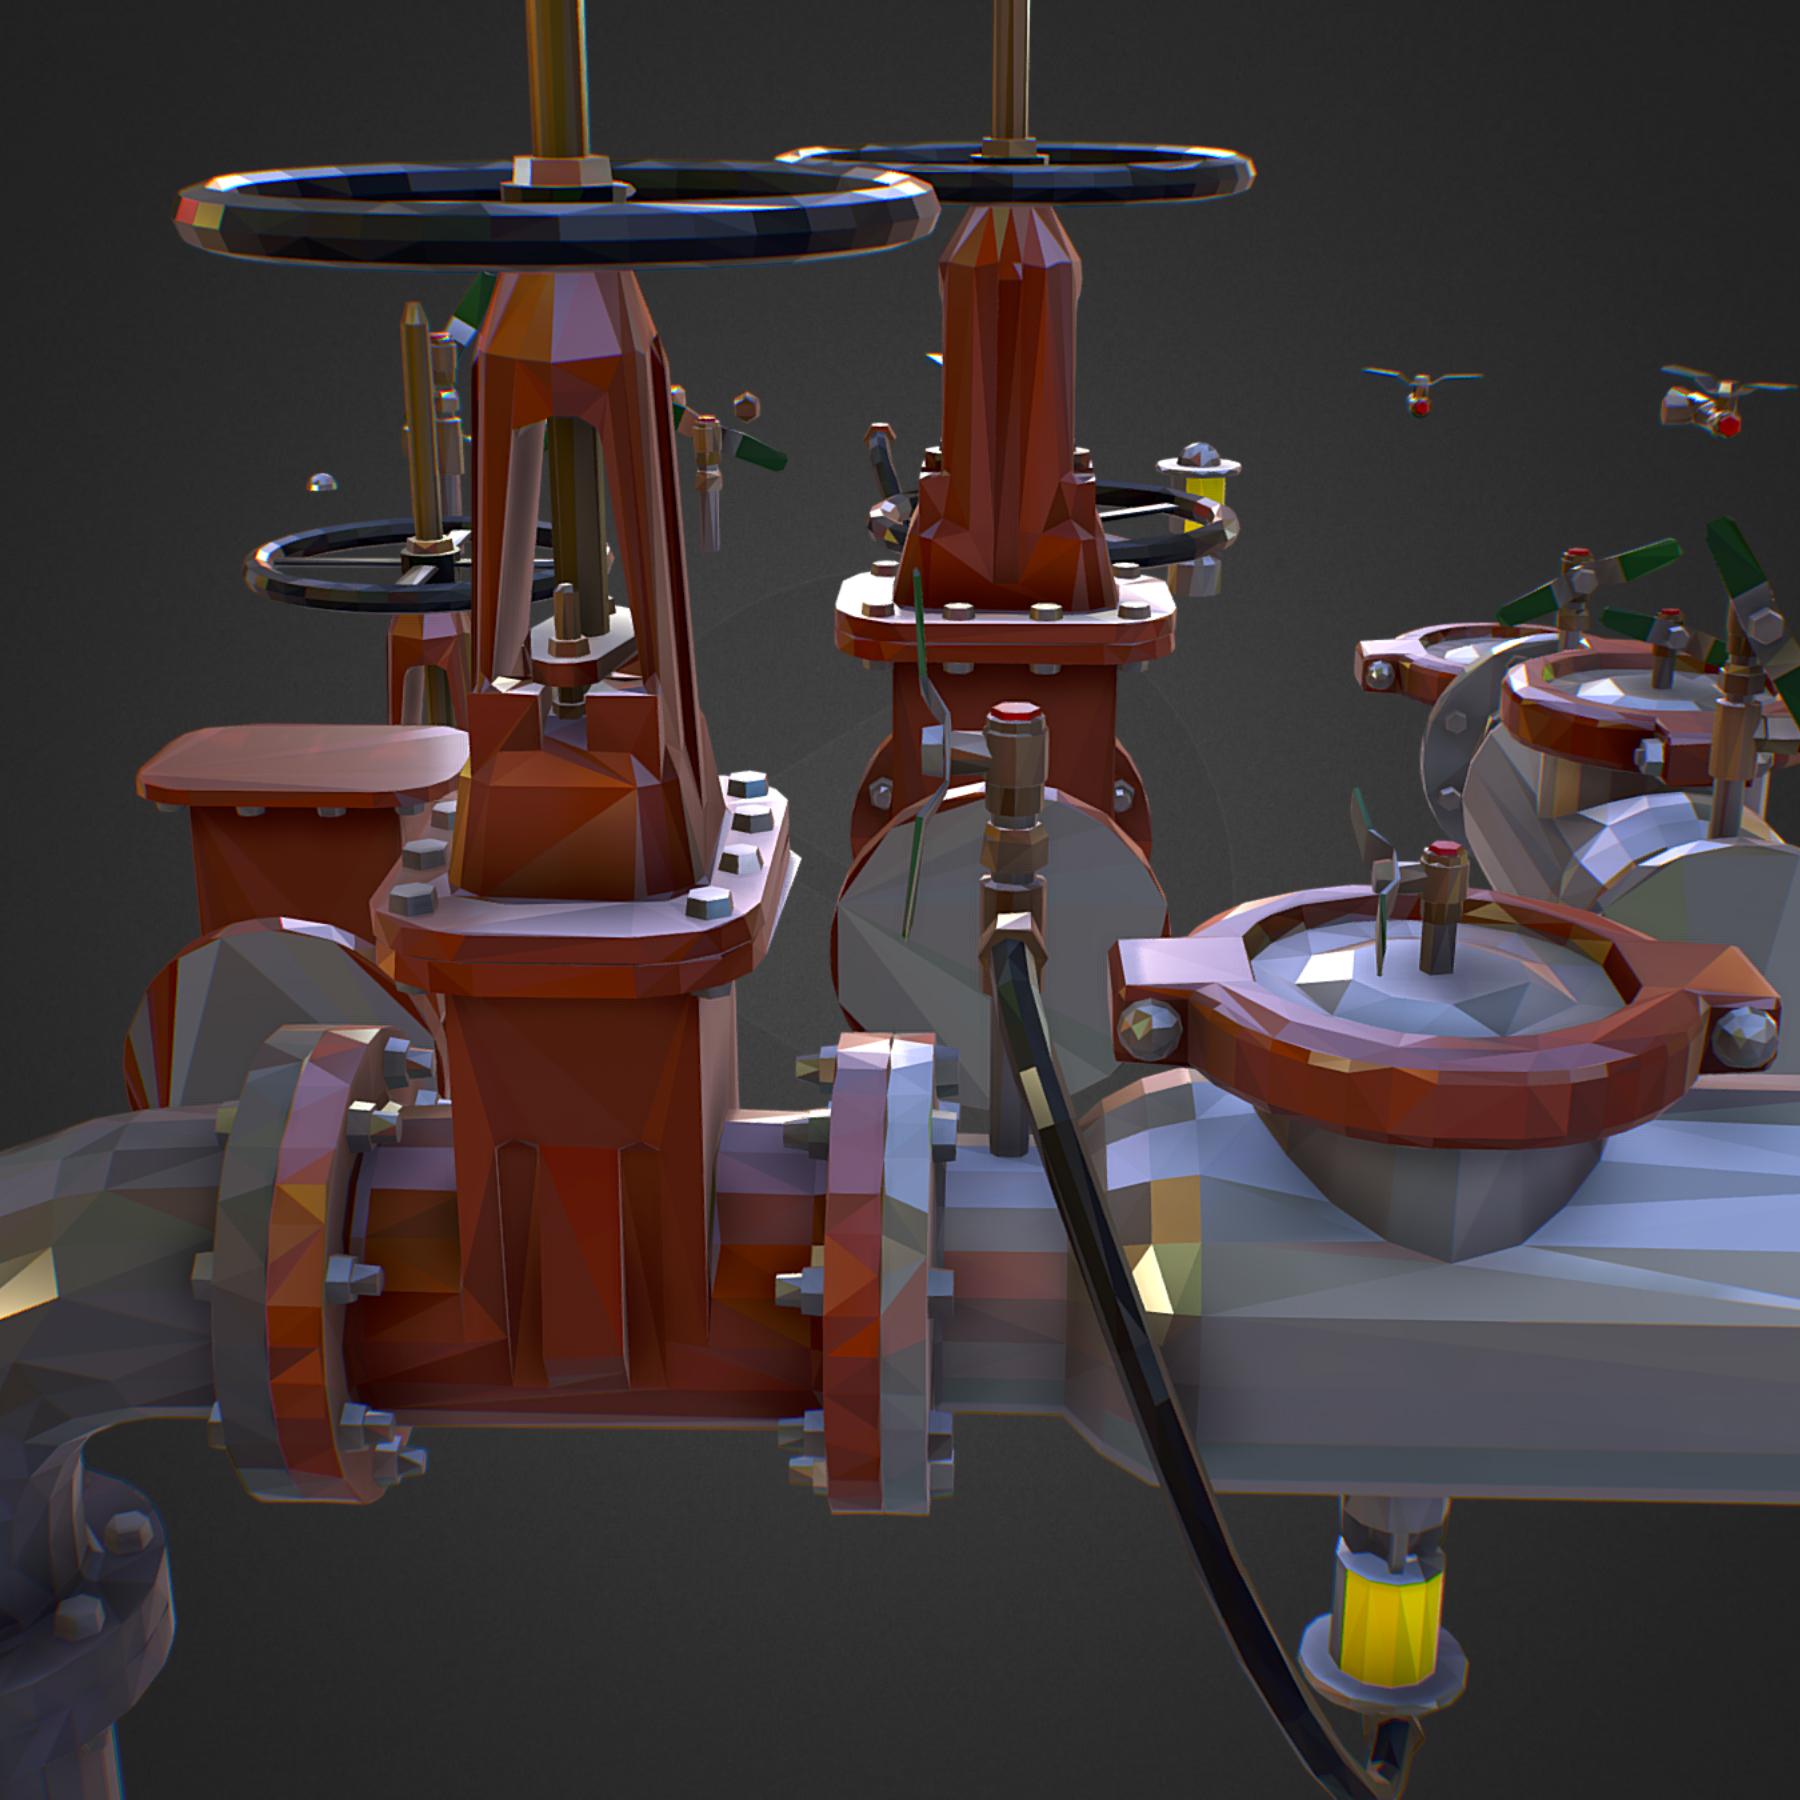 Low Poly ART Backflow Water Pipe Constructor 3d model max 3ds max plugin fbx ma mb tga targa icb vda vst pix obj 272555